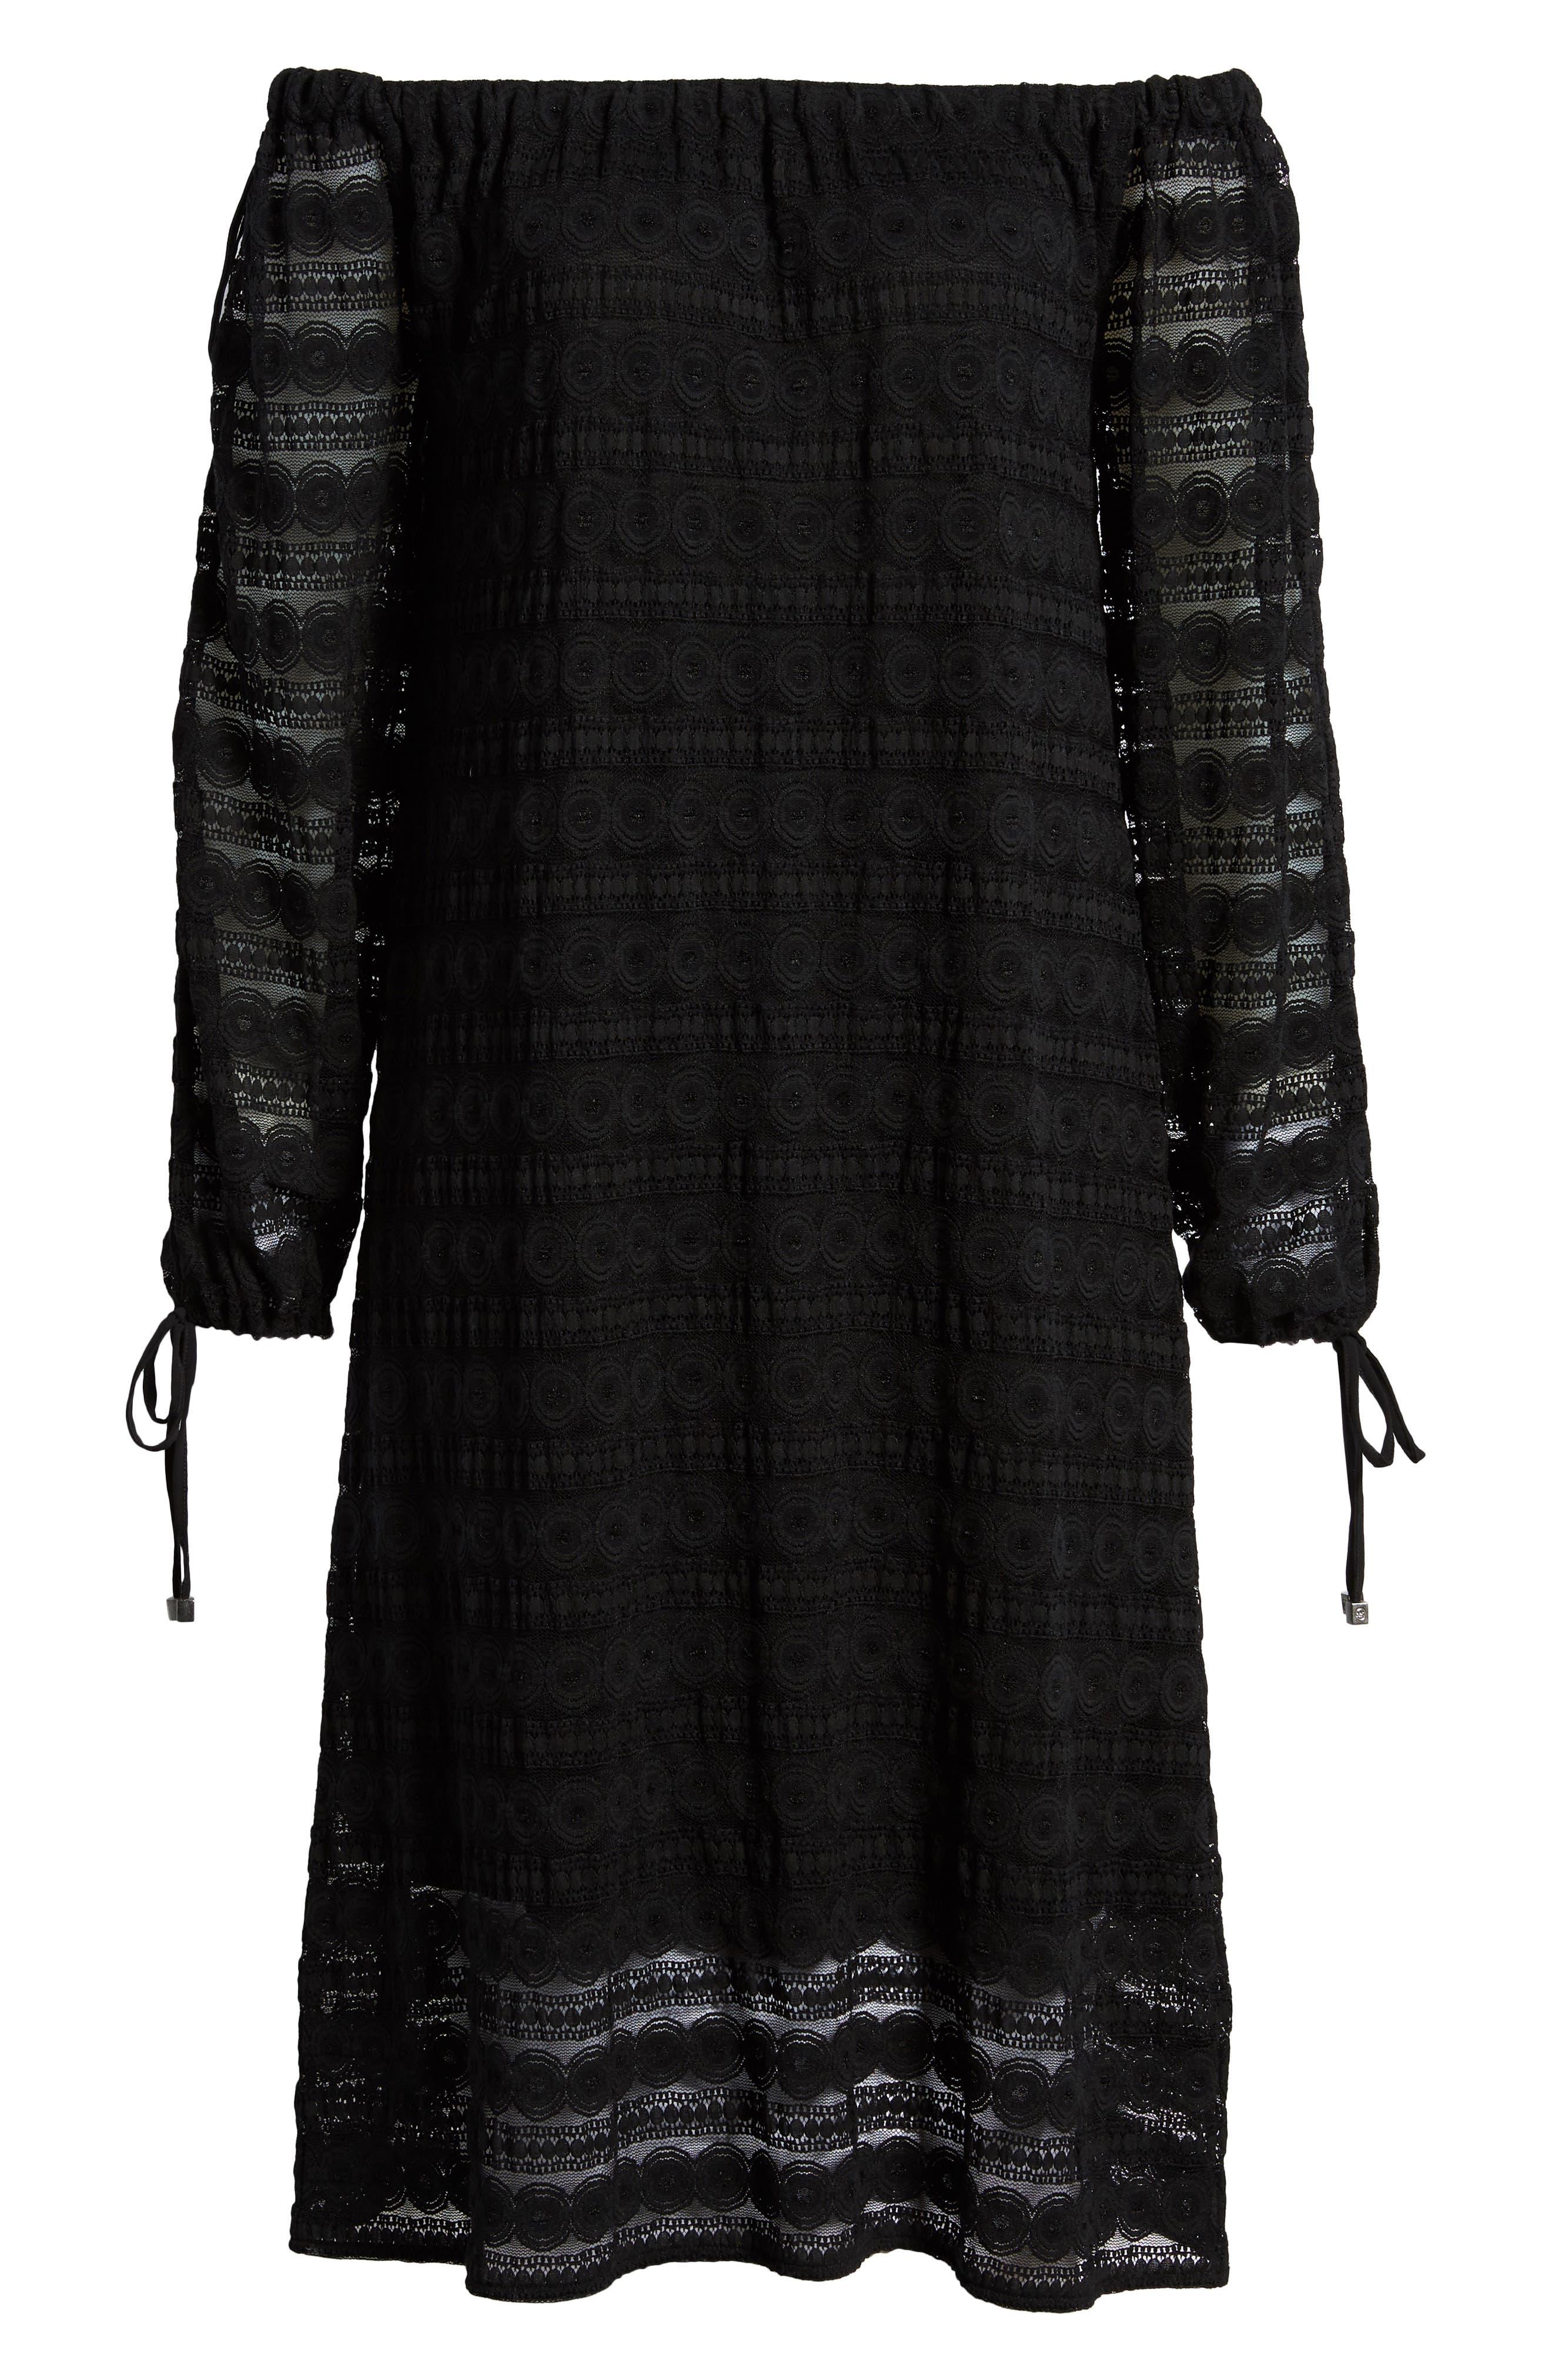 Circle Medallion Lace Off the Shoulder Dress,                             Alternate thumbnail 7, color,                             Black